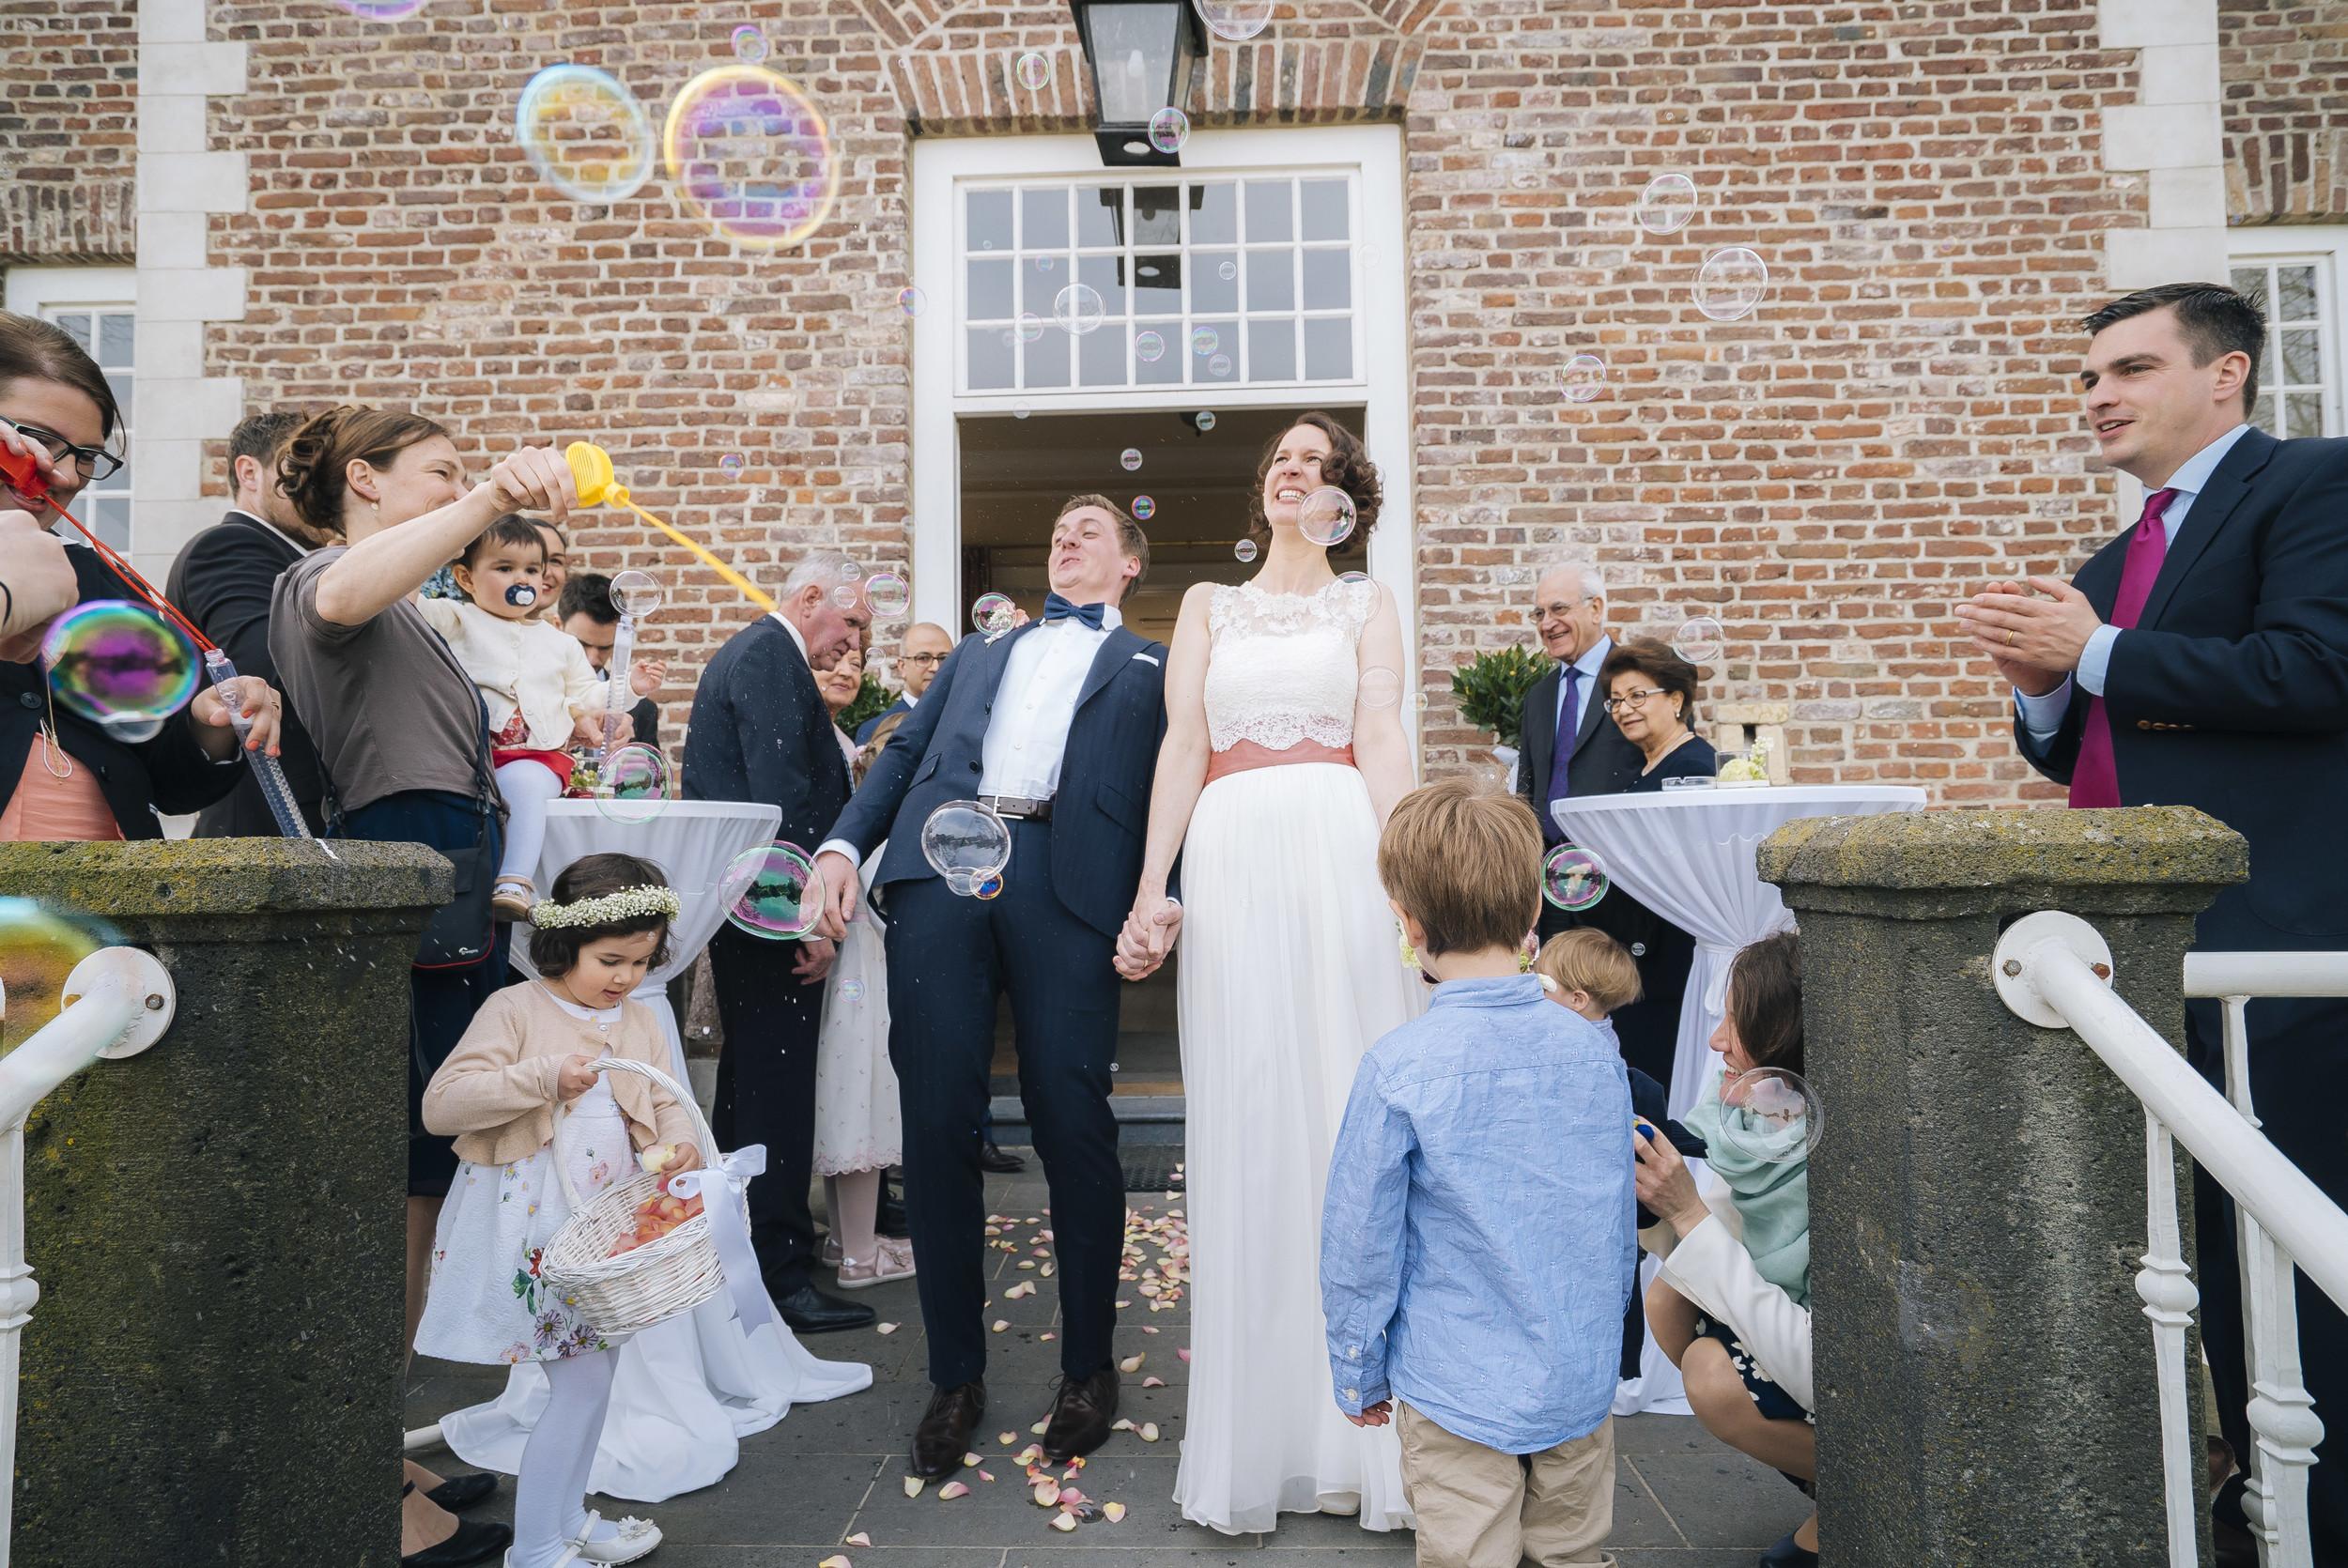 Hochzeitsfotograf-Schlossruine-Hertefeld-Weeze-088.jpg